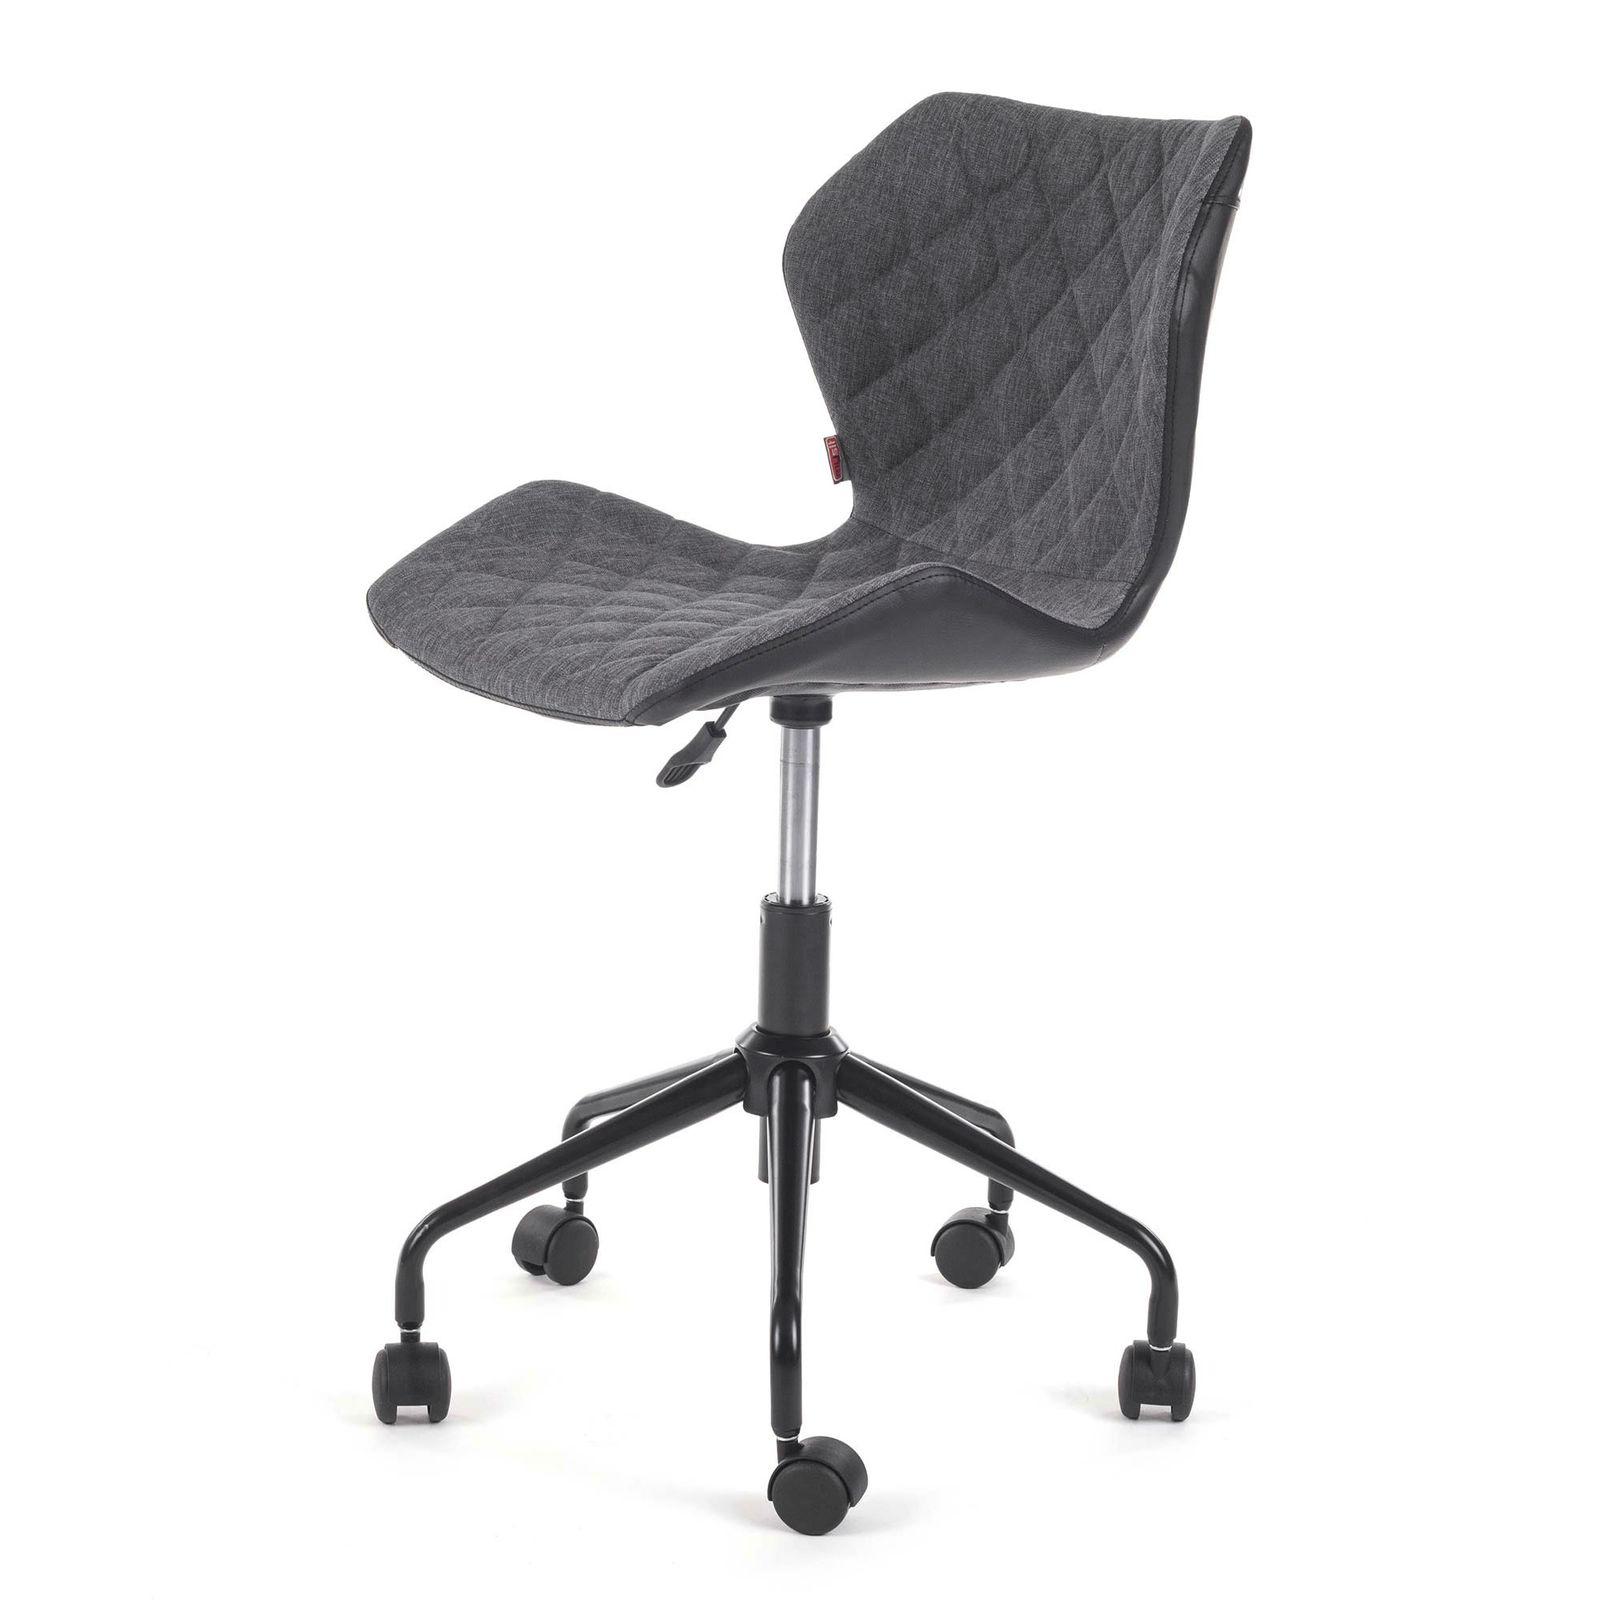 my sit chaise de bureau siege de bureau tabouret ino noir gris bureau chaises de bureau. Black Bedroom Furniture Sets. Home Design Ideas